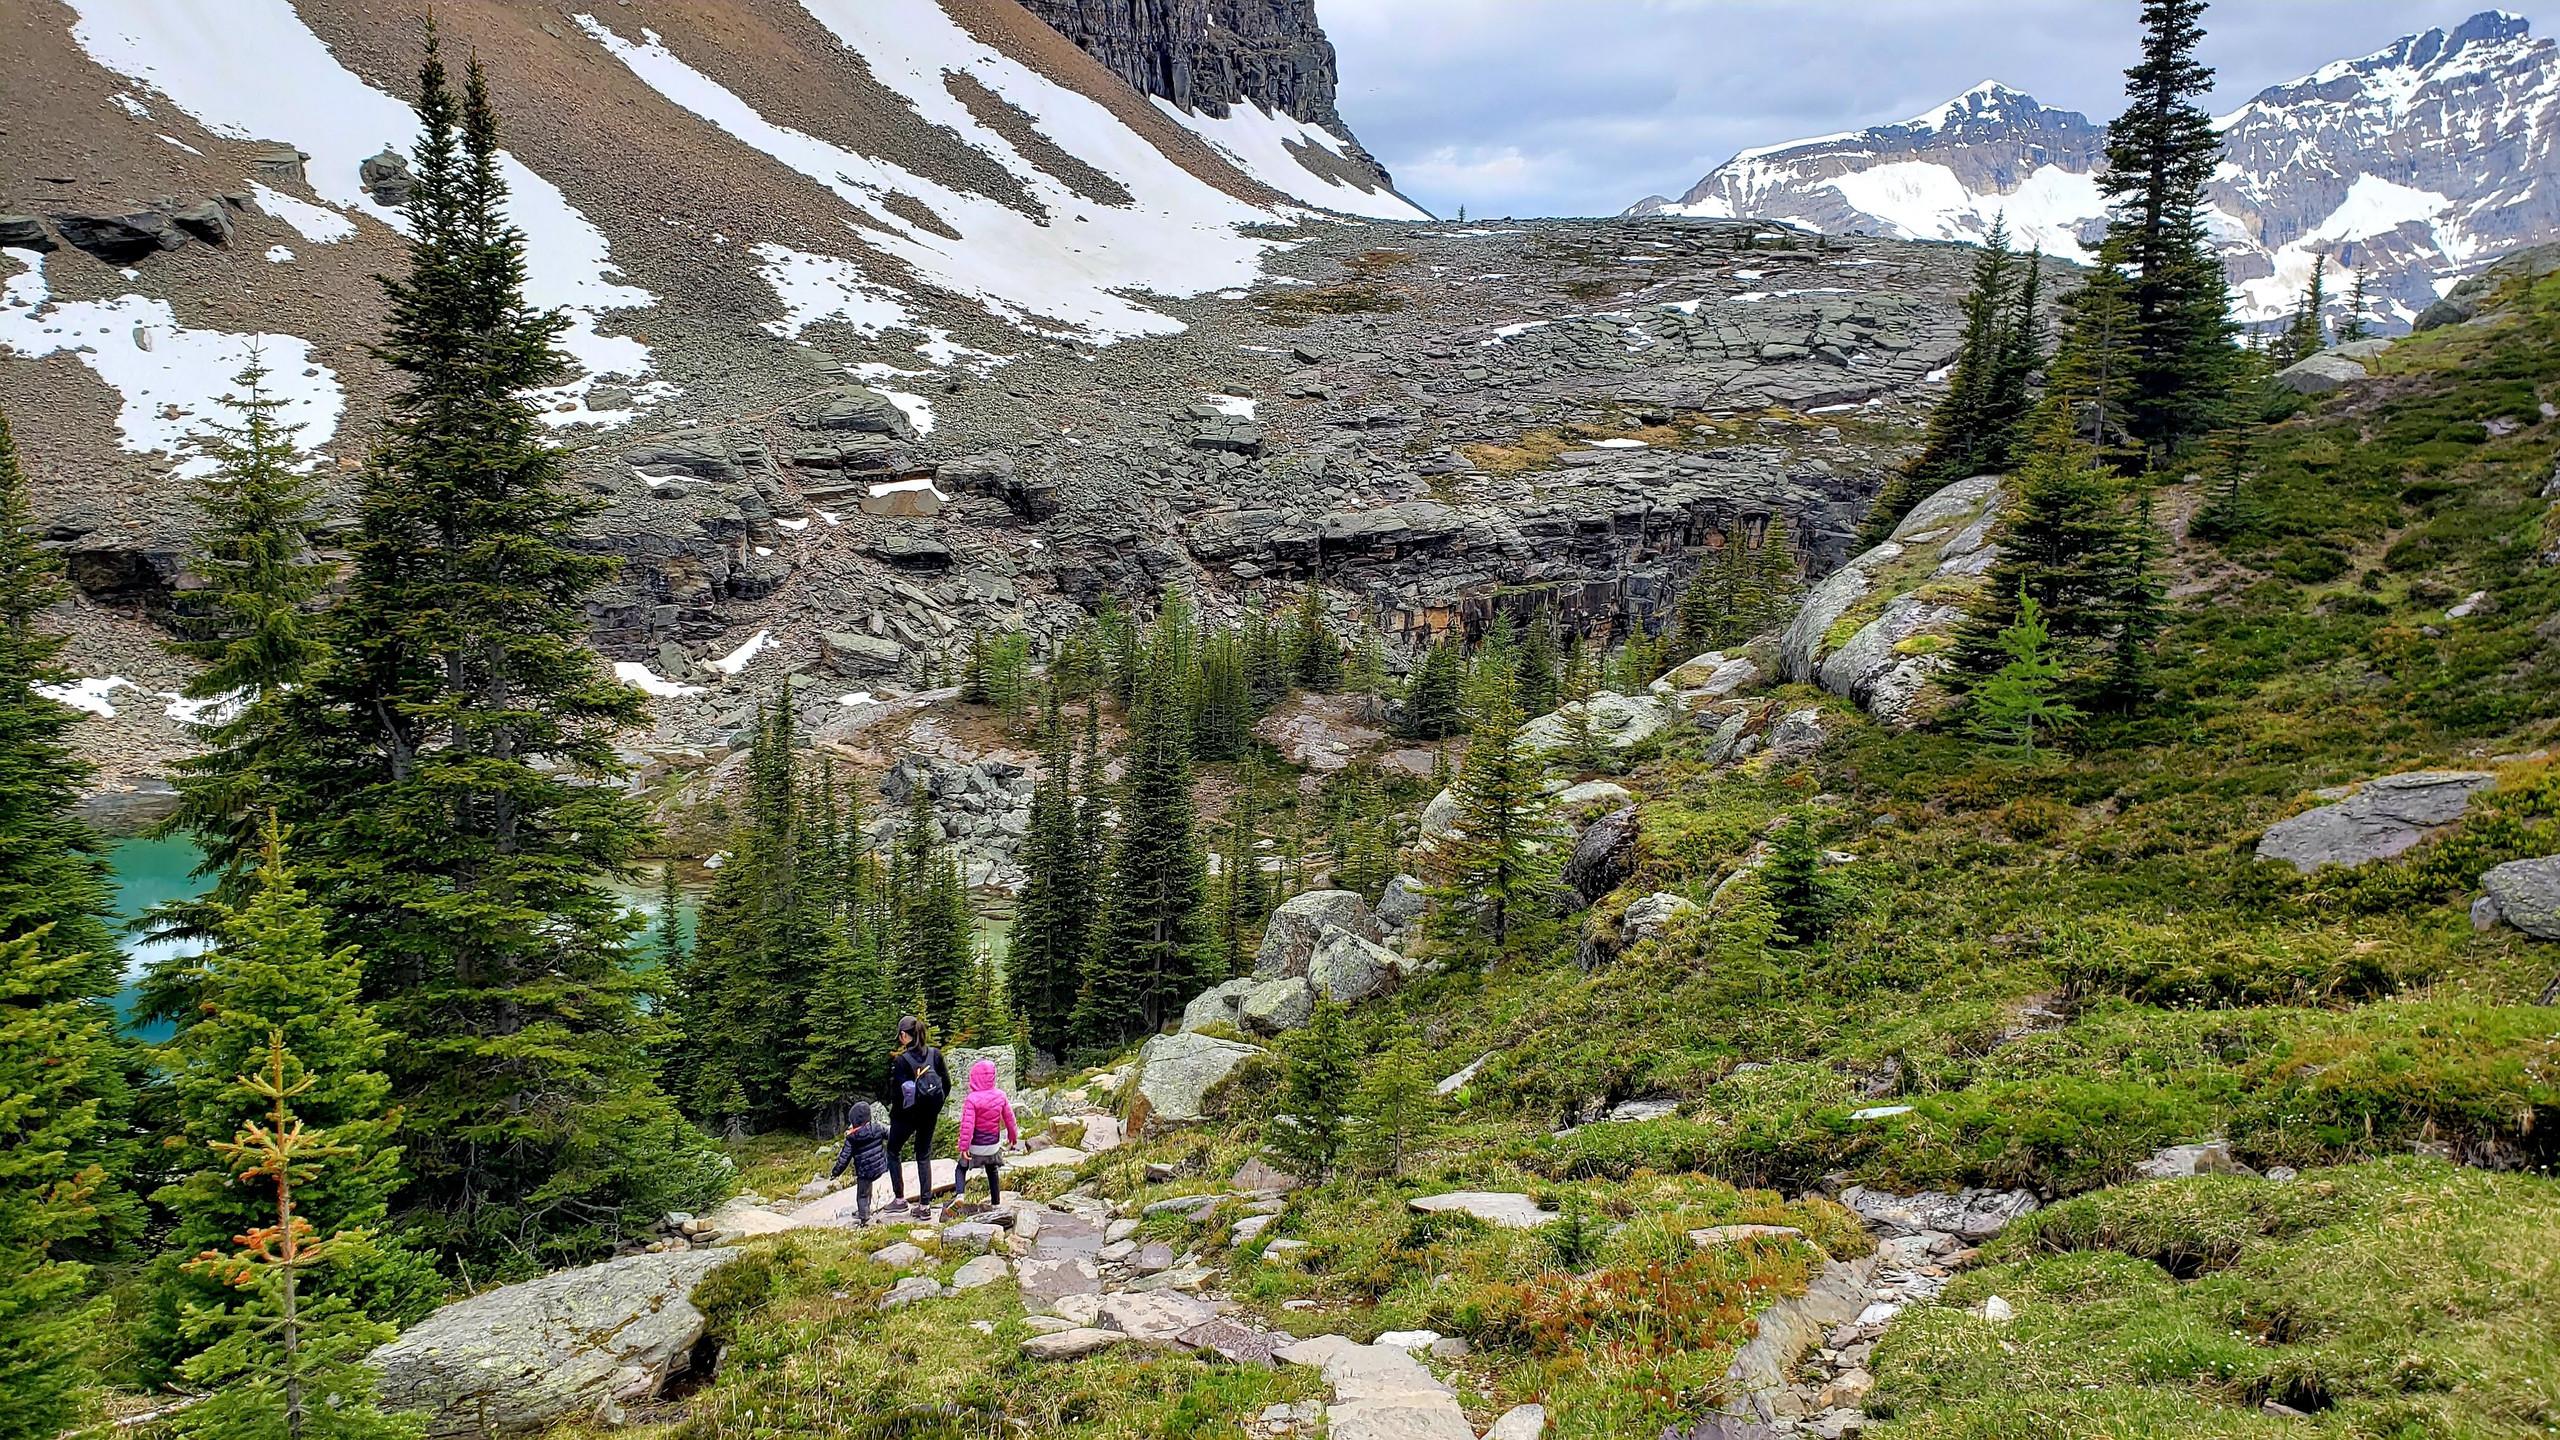 Hiking in the Canadian Rockies, Lake Oesa Trail, Yoho National Park, B.C.